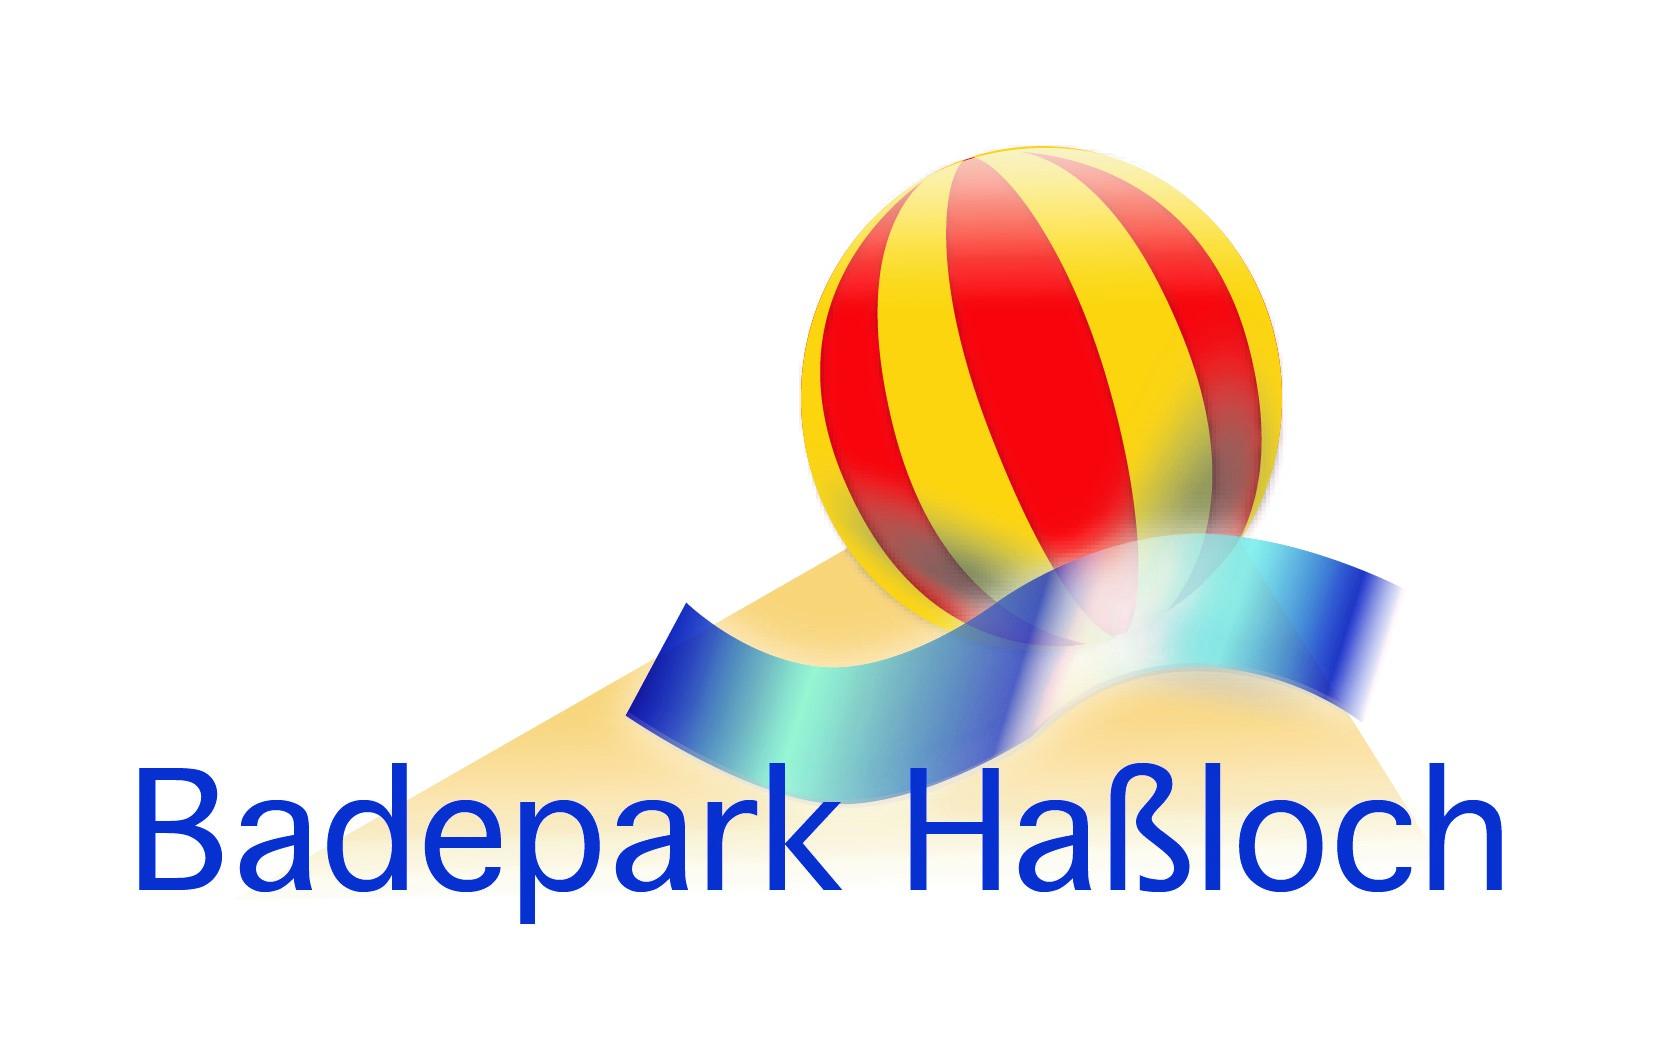 Gemeindewerke Haßloch GmbH